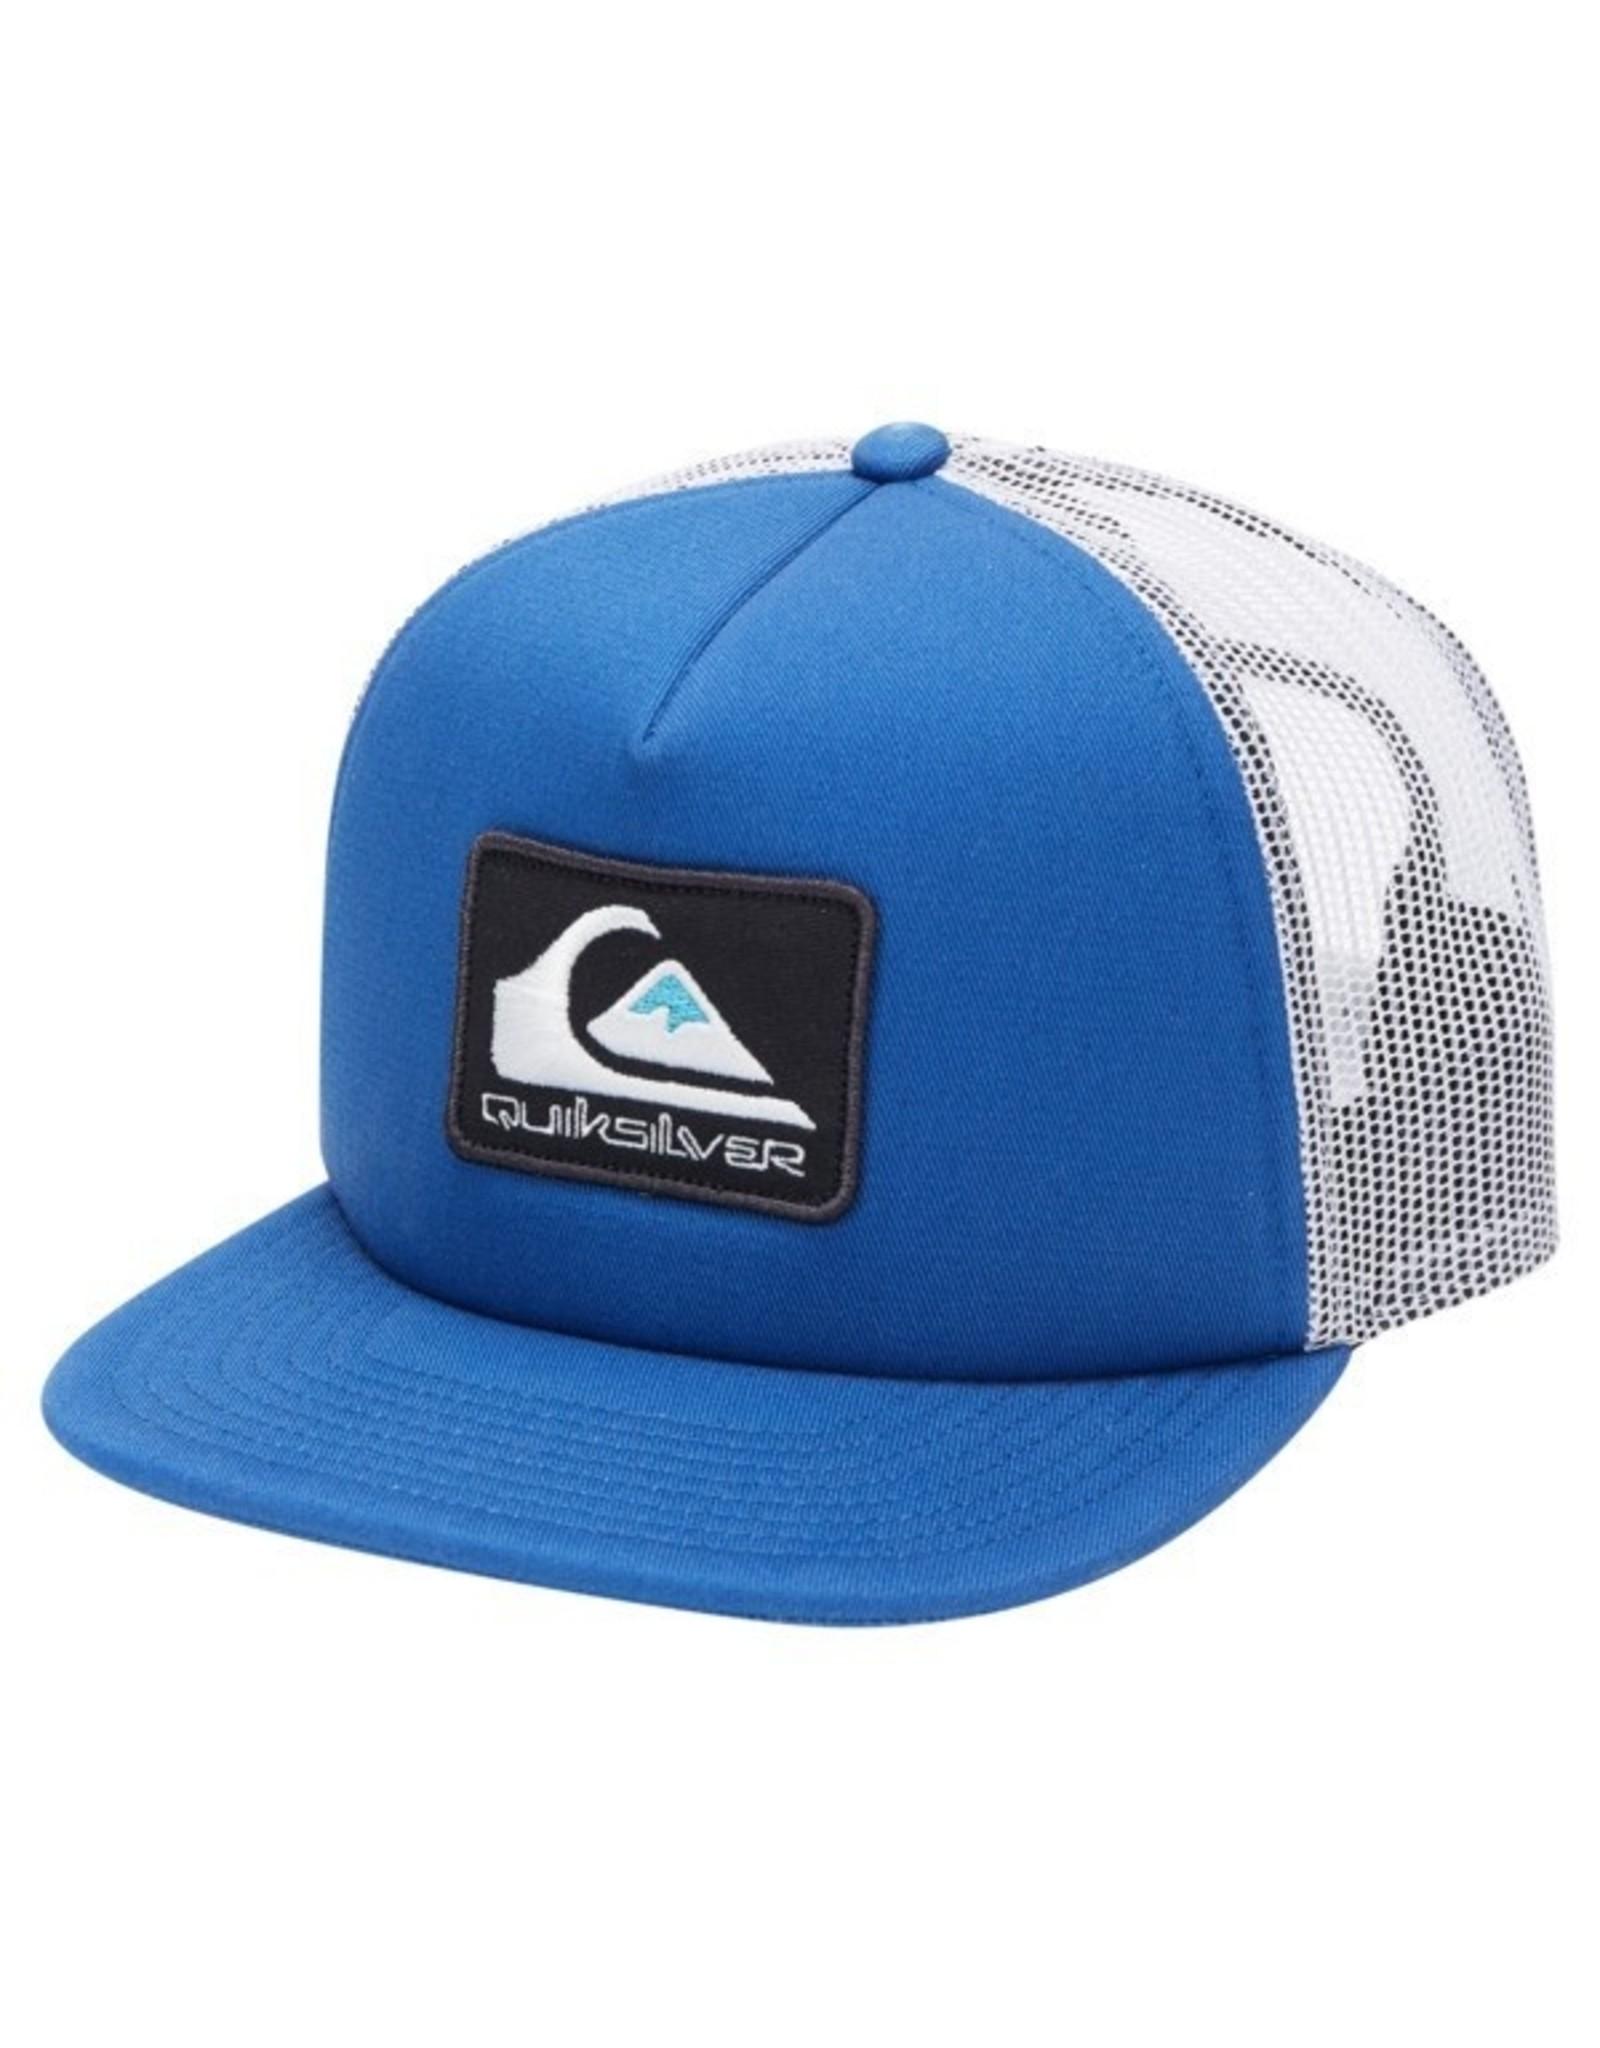 Quiksilver SP21 Omnipresence Hat Blue 6+Y